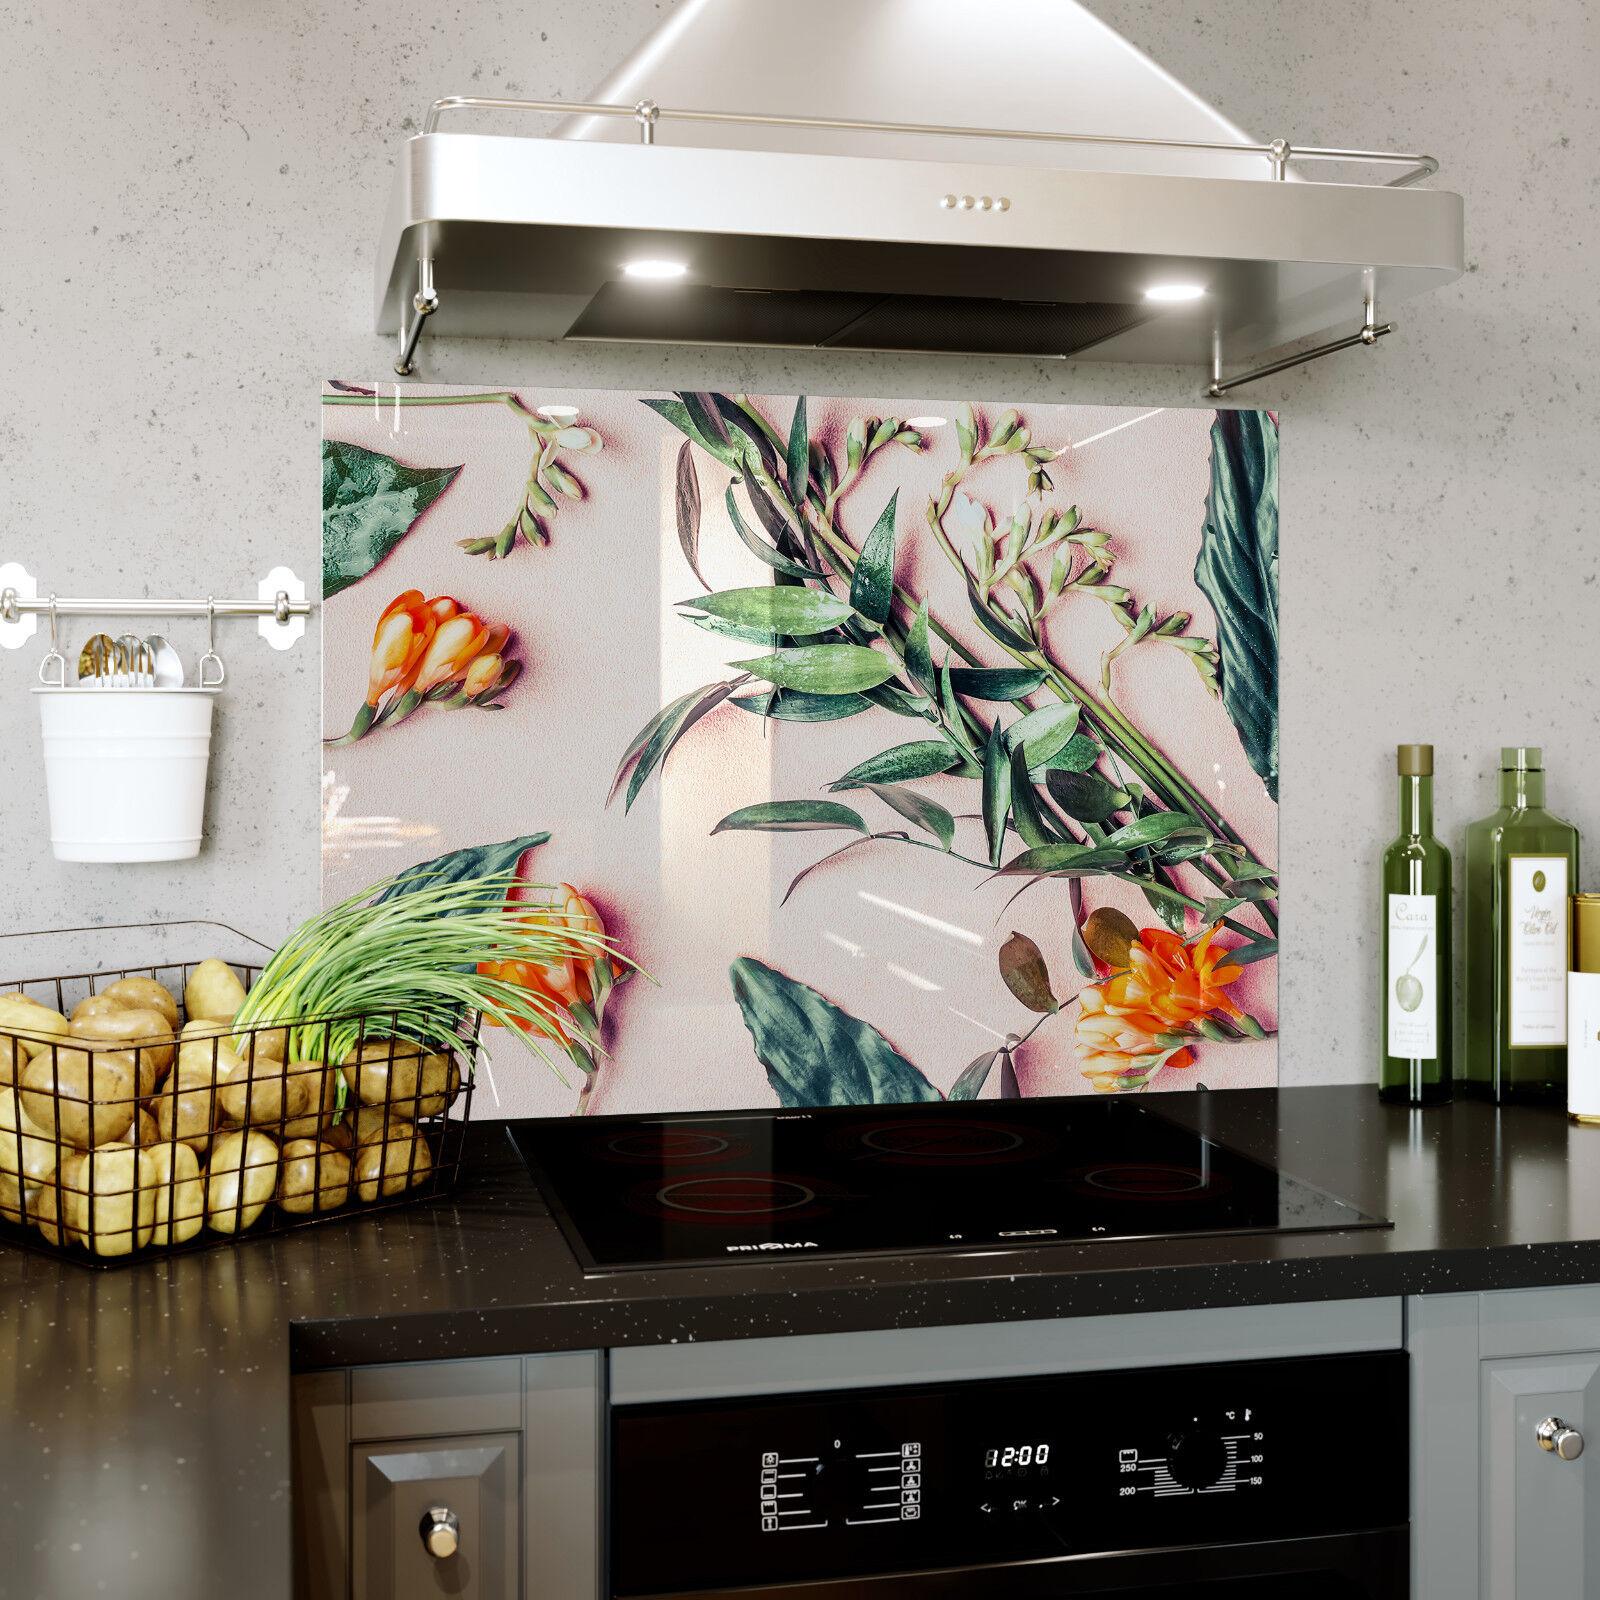 Cocina de vidrio vidrio de templado de ESG salpicaduras de pared trasera botánico Flor Prizma SB0355 1668f7